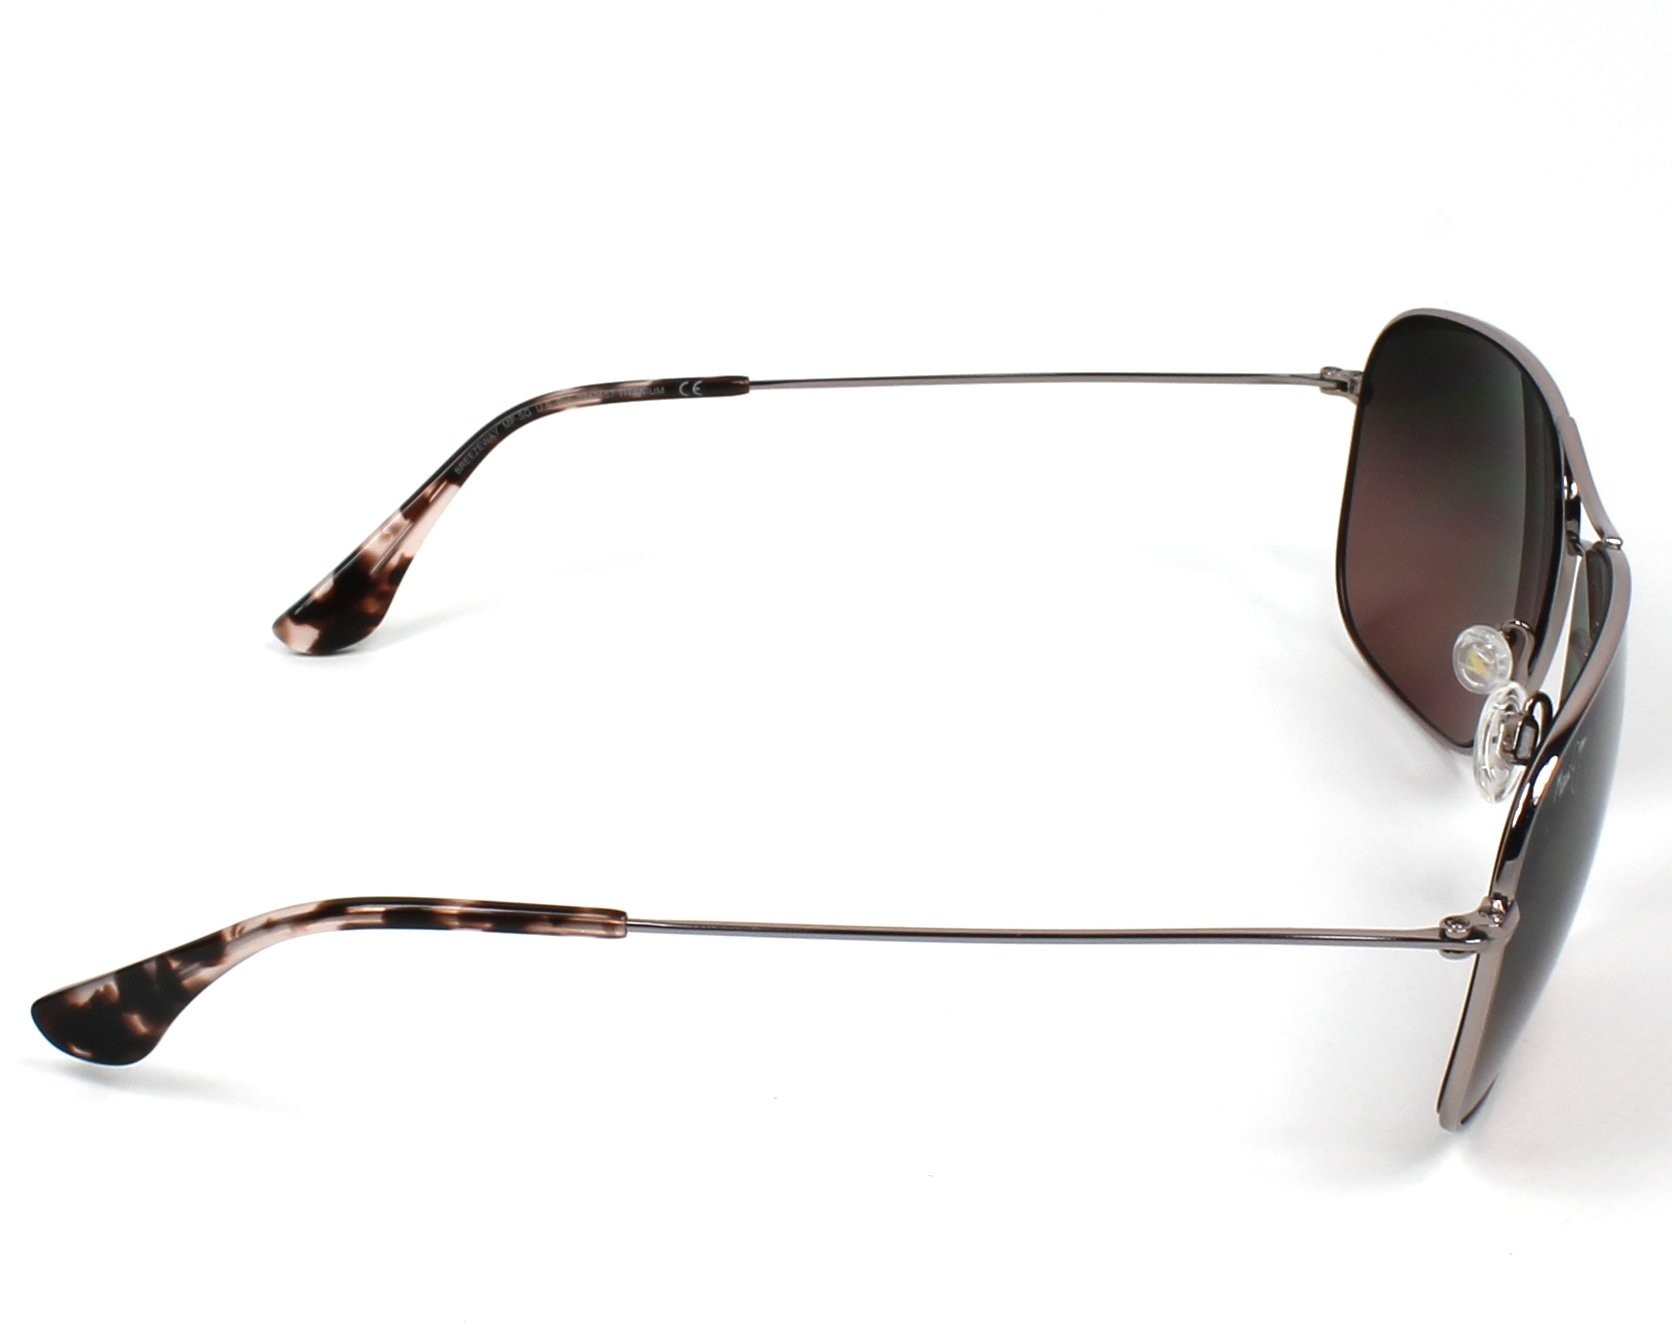 fa193056f43 Sunglasses Maui Jim RS-773 16R - Silver side view